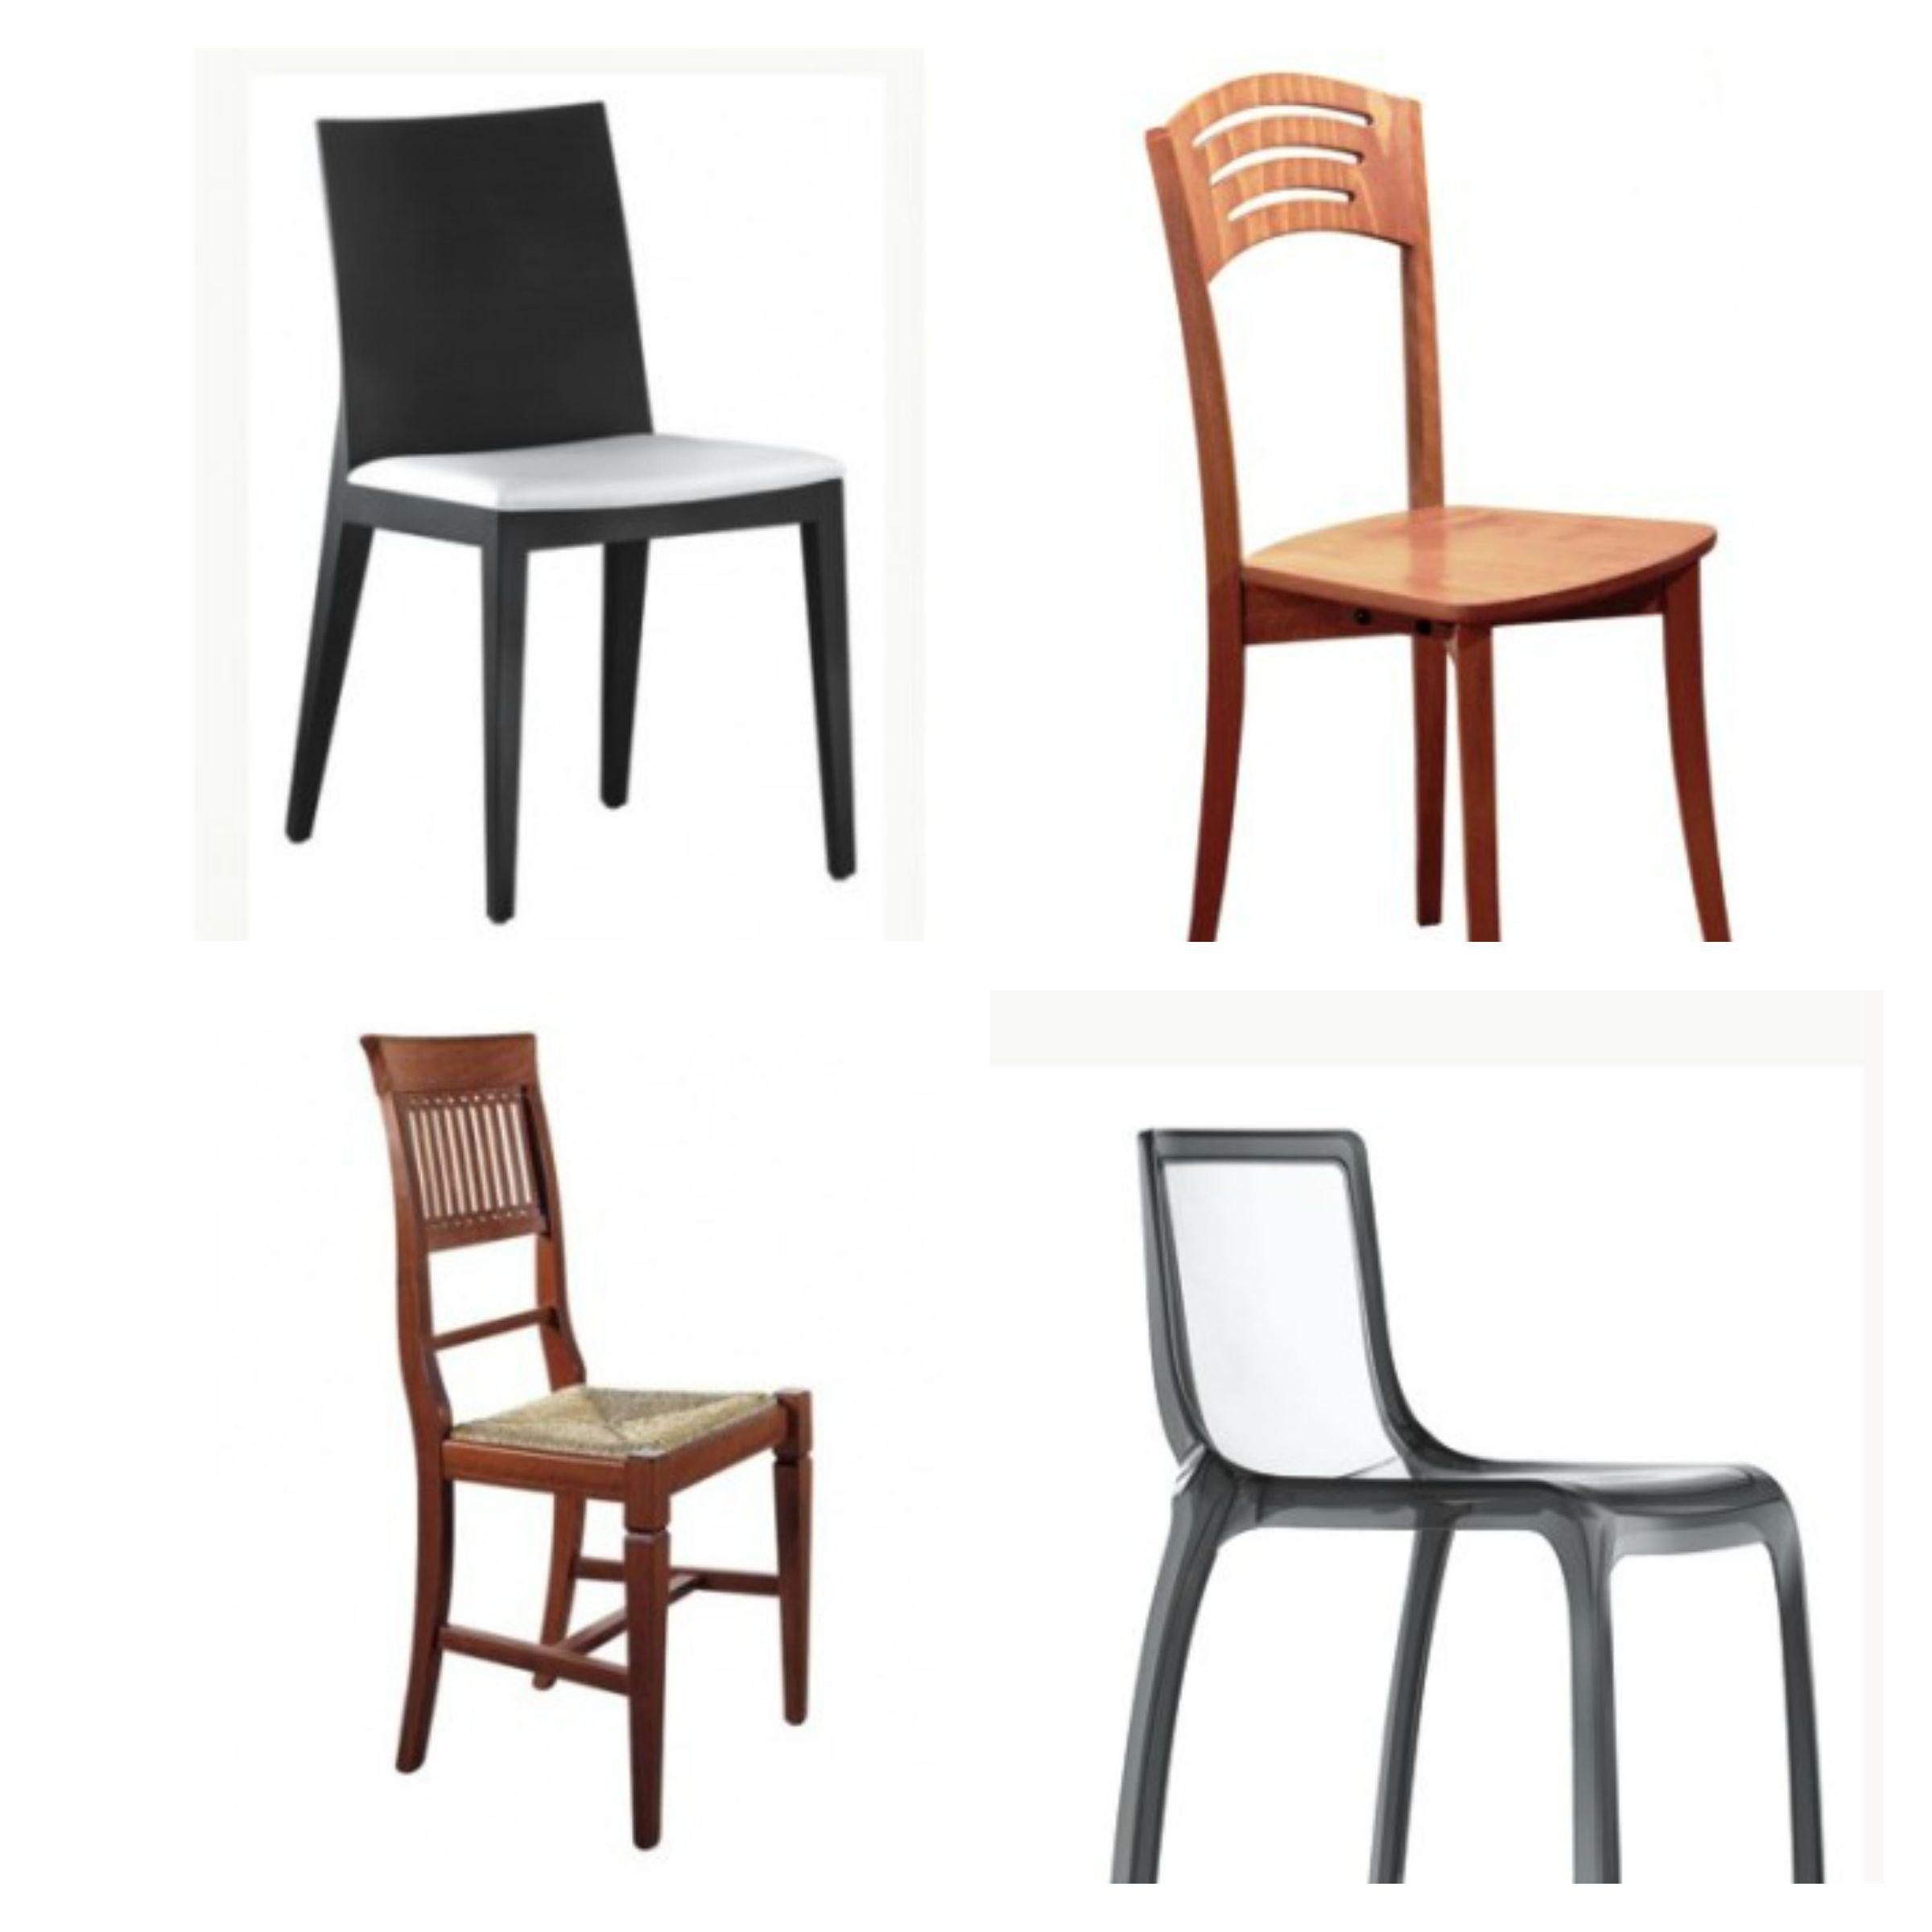 Sedie per sala da pranzo vendita on line design casa for Mobili per sala da pranzo moderni